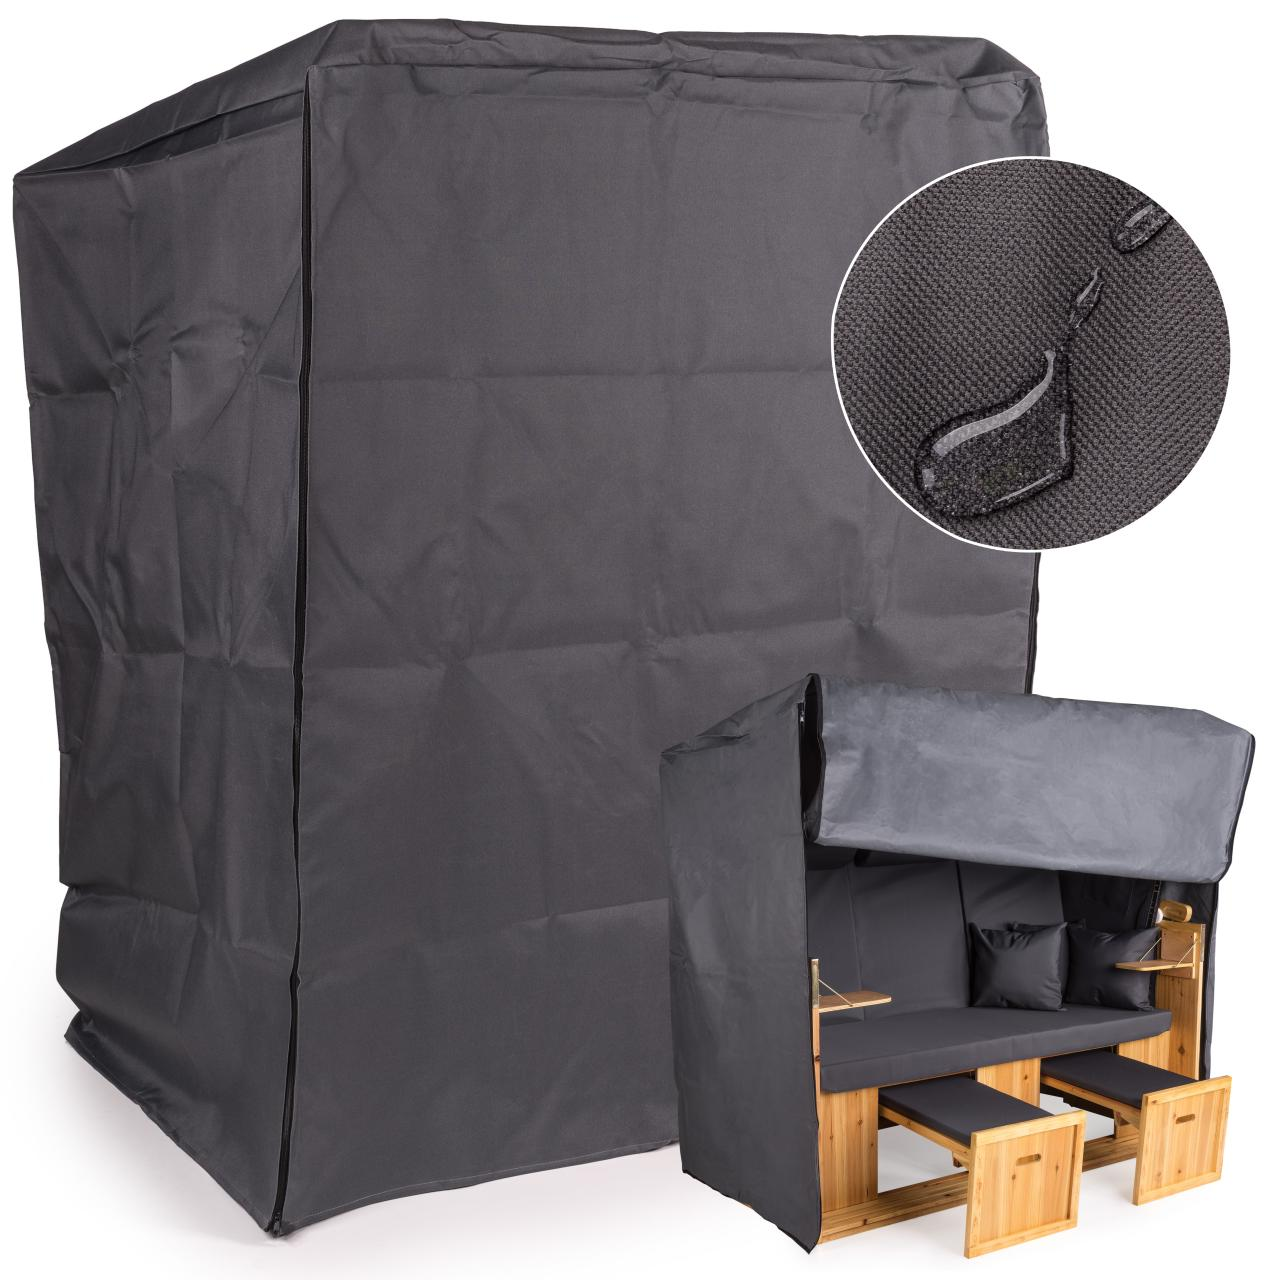 schutzh lle f r strandkorb regenabdeckung abdeckplane. Black Bedroom Furniture Sets. Home Design Ideas